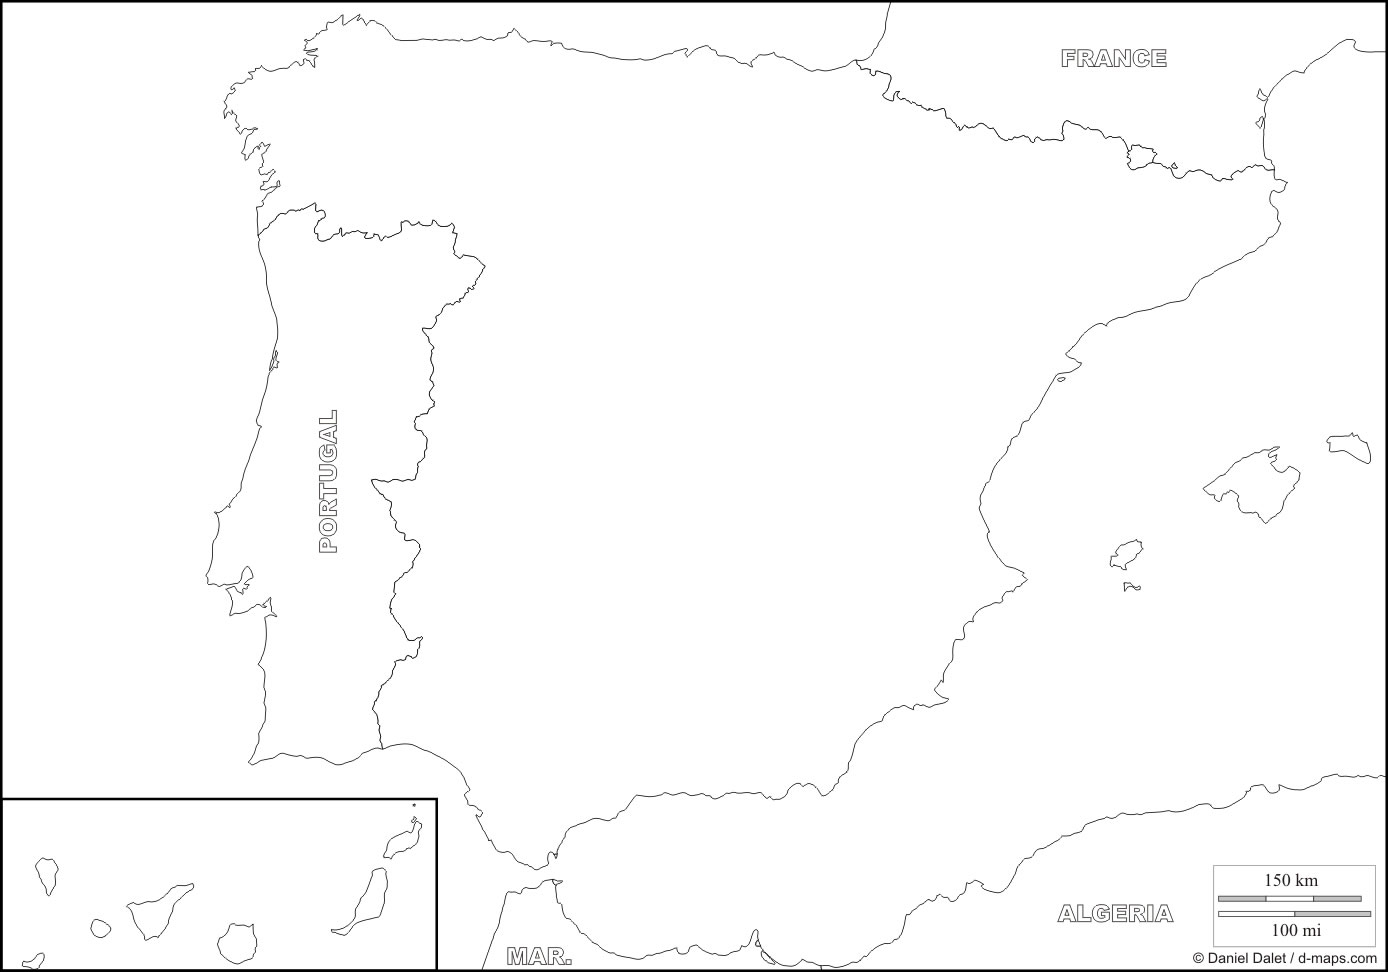 Carte Espagne Vierge, Carte Vierge De L'espagne serapportantà Carte Vierge De France